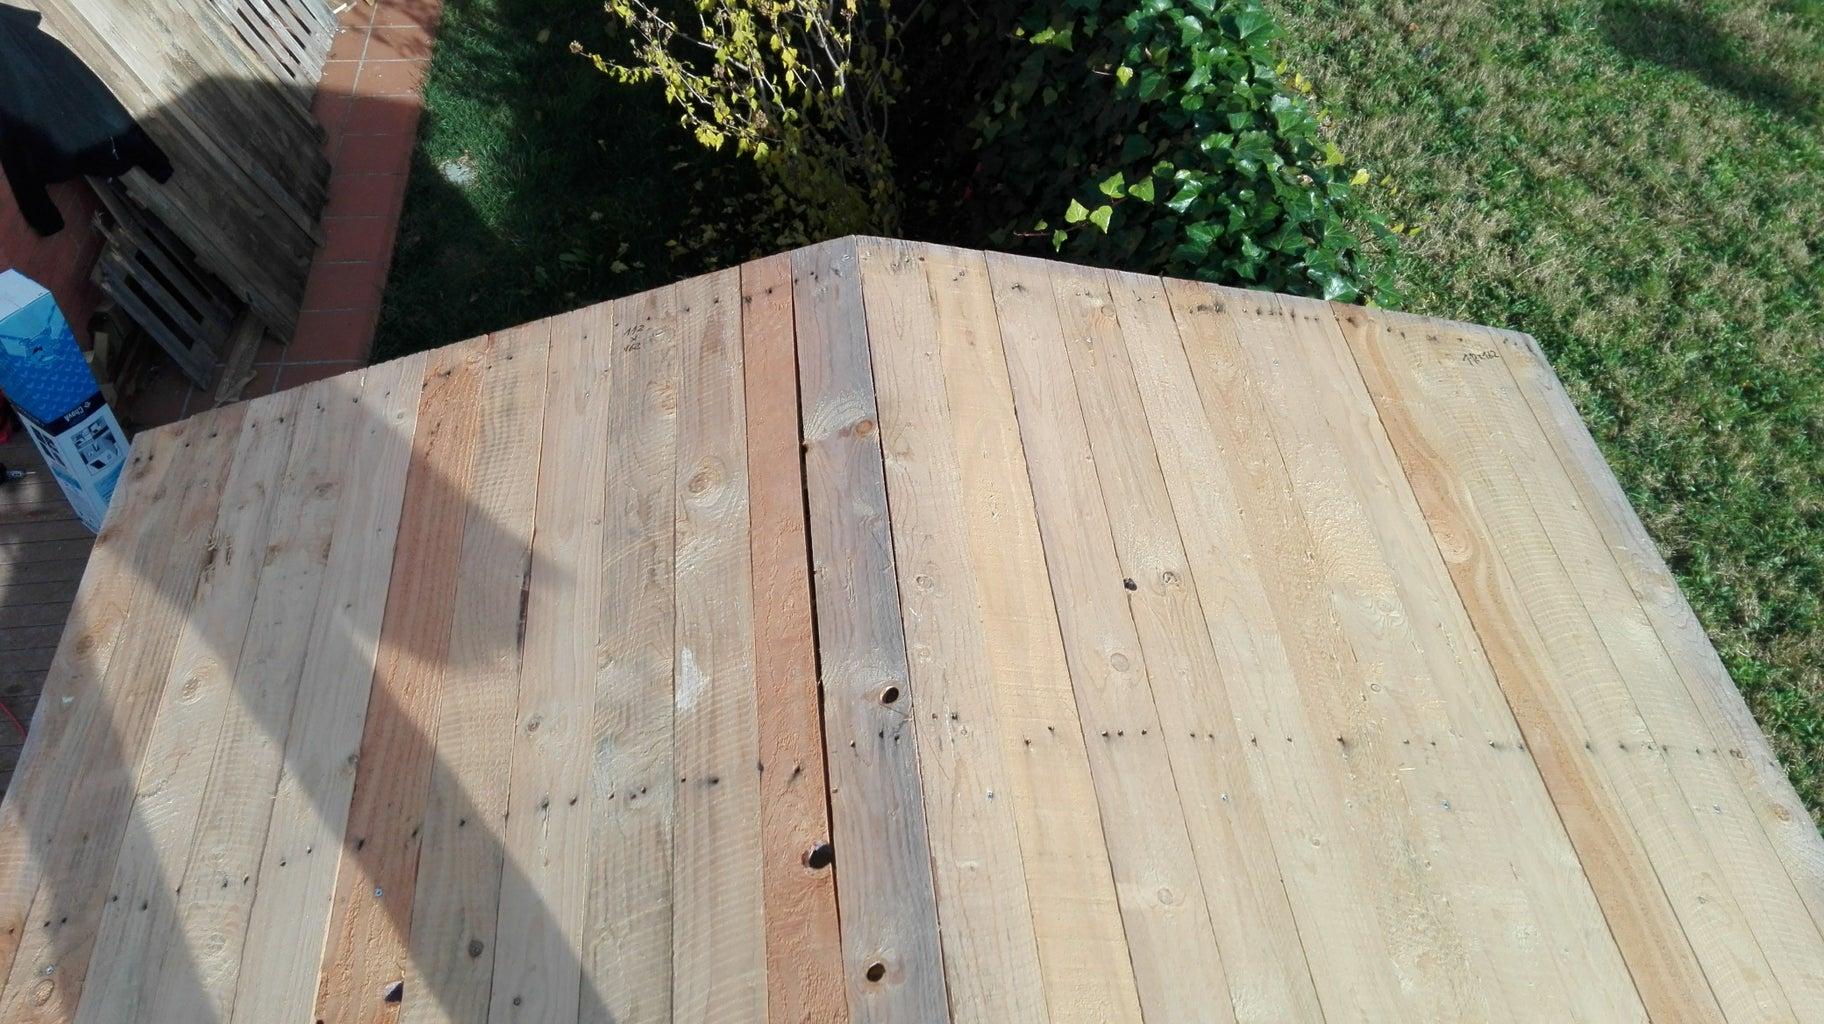 Waterproofing the Wooden Roof